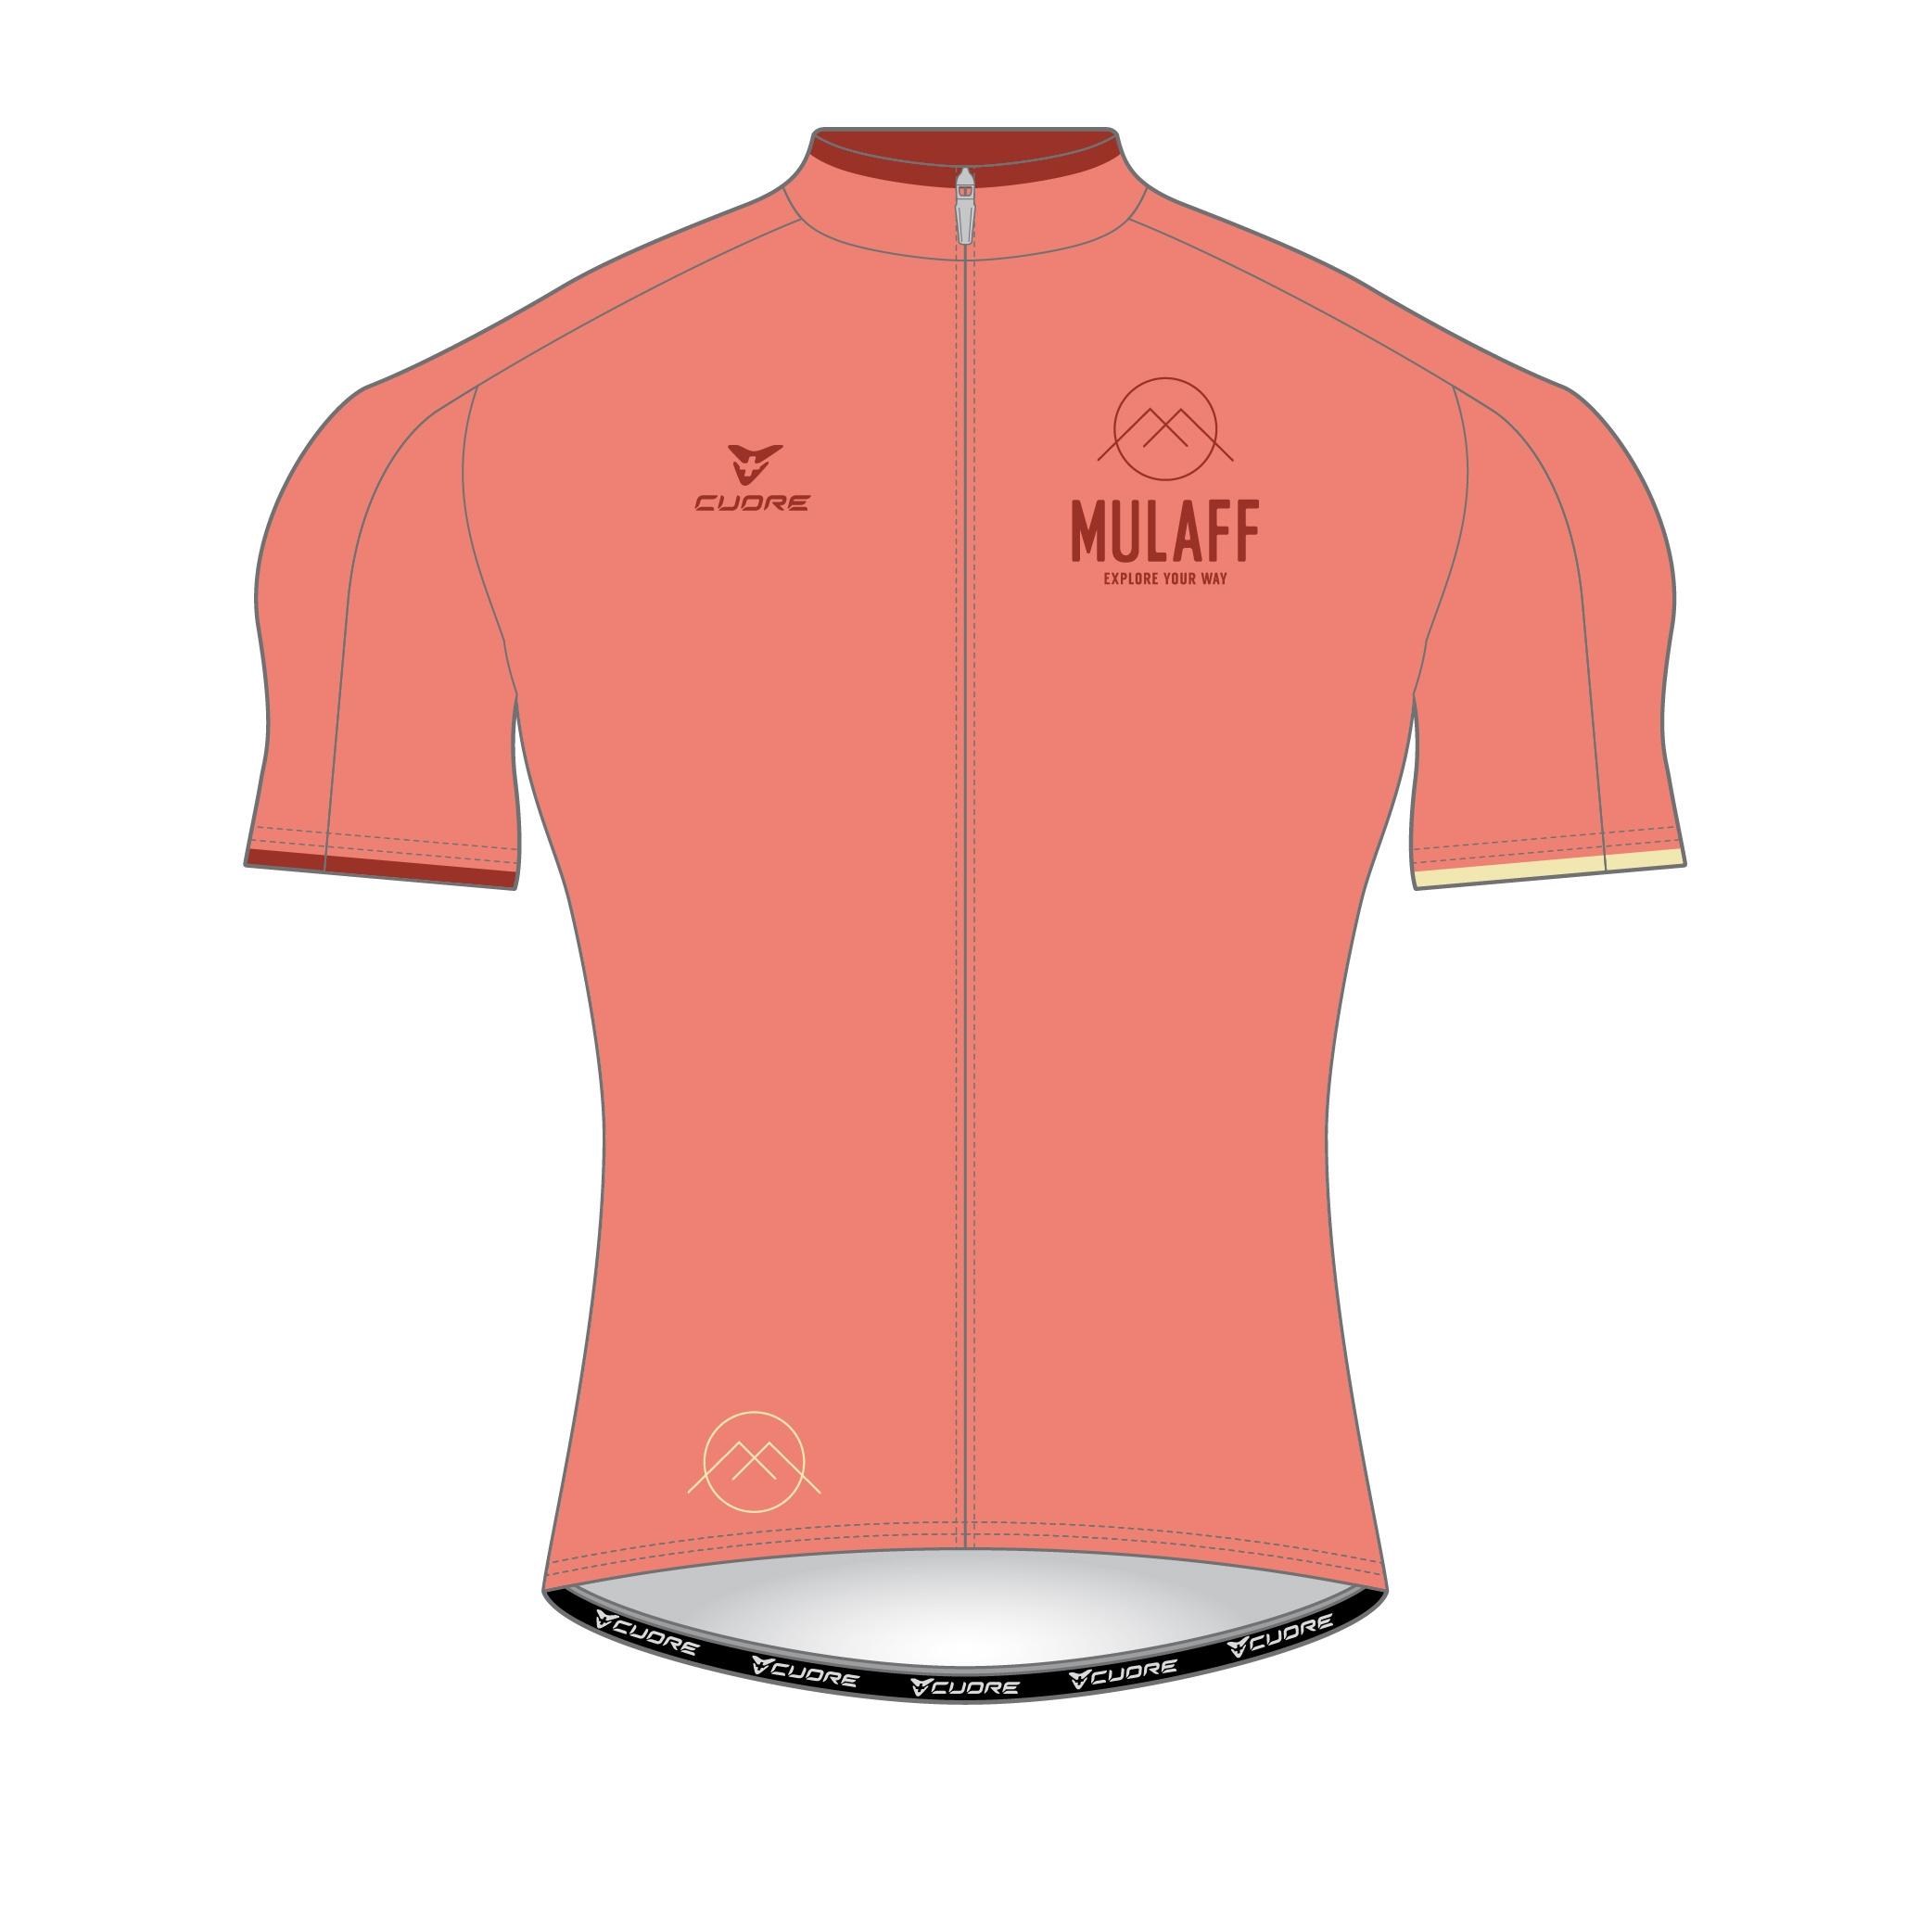 MULAFF BIKE CLOTHING 2019